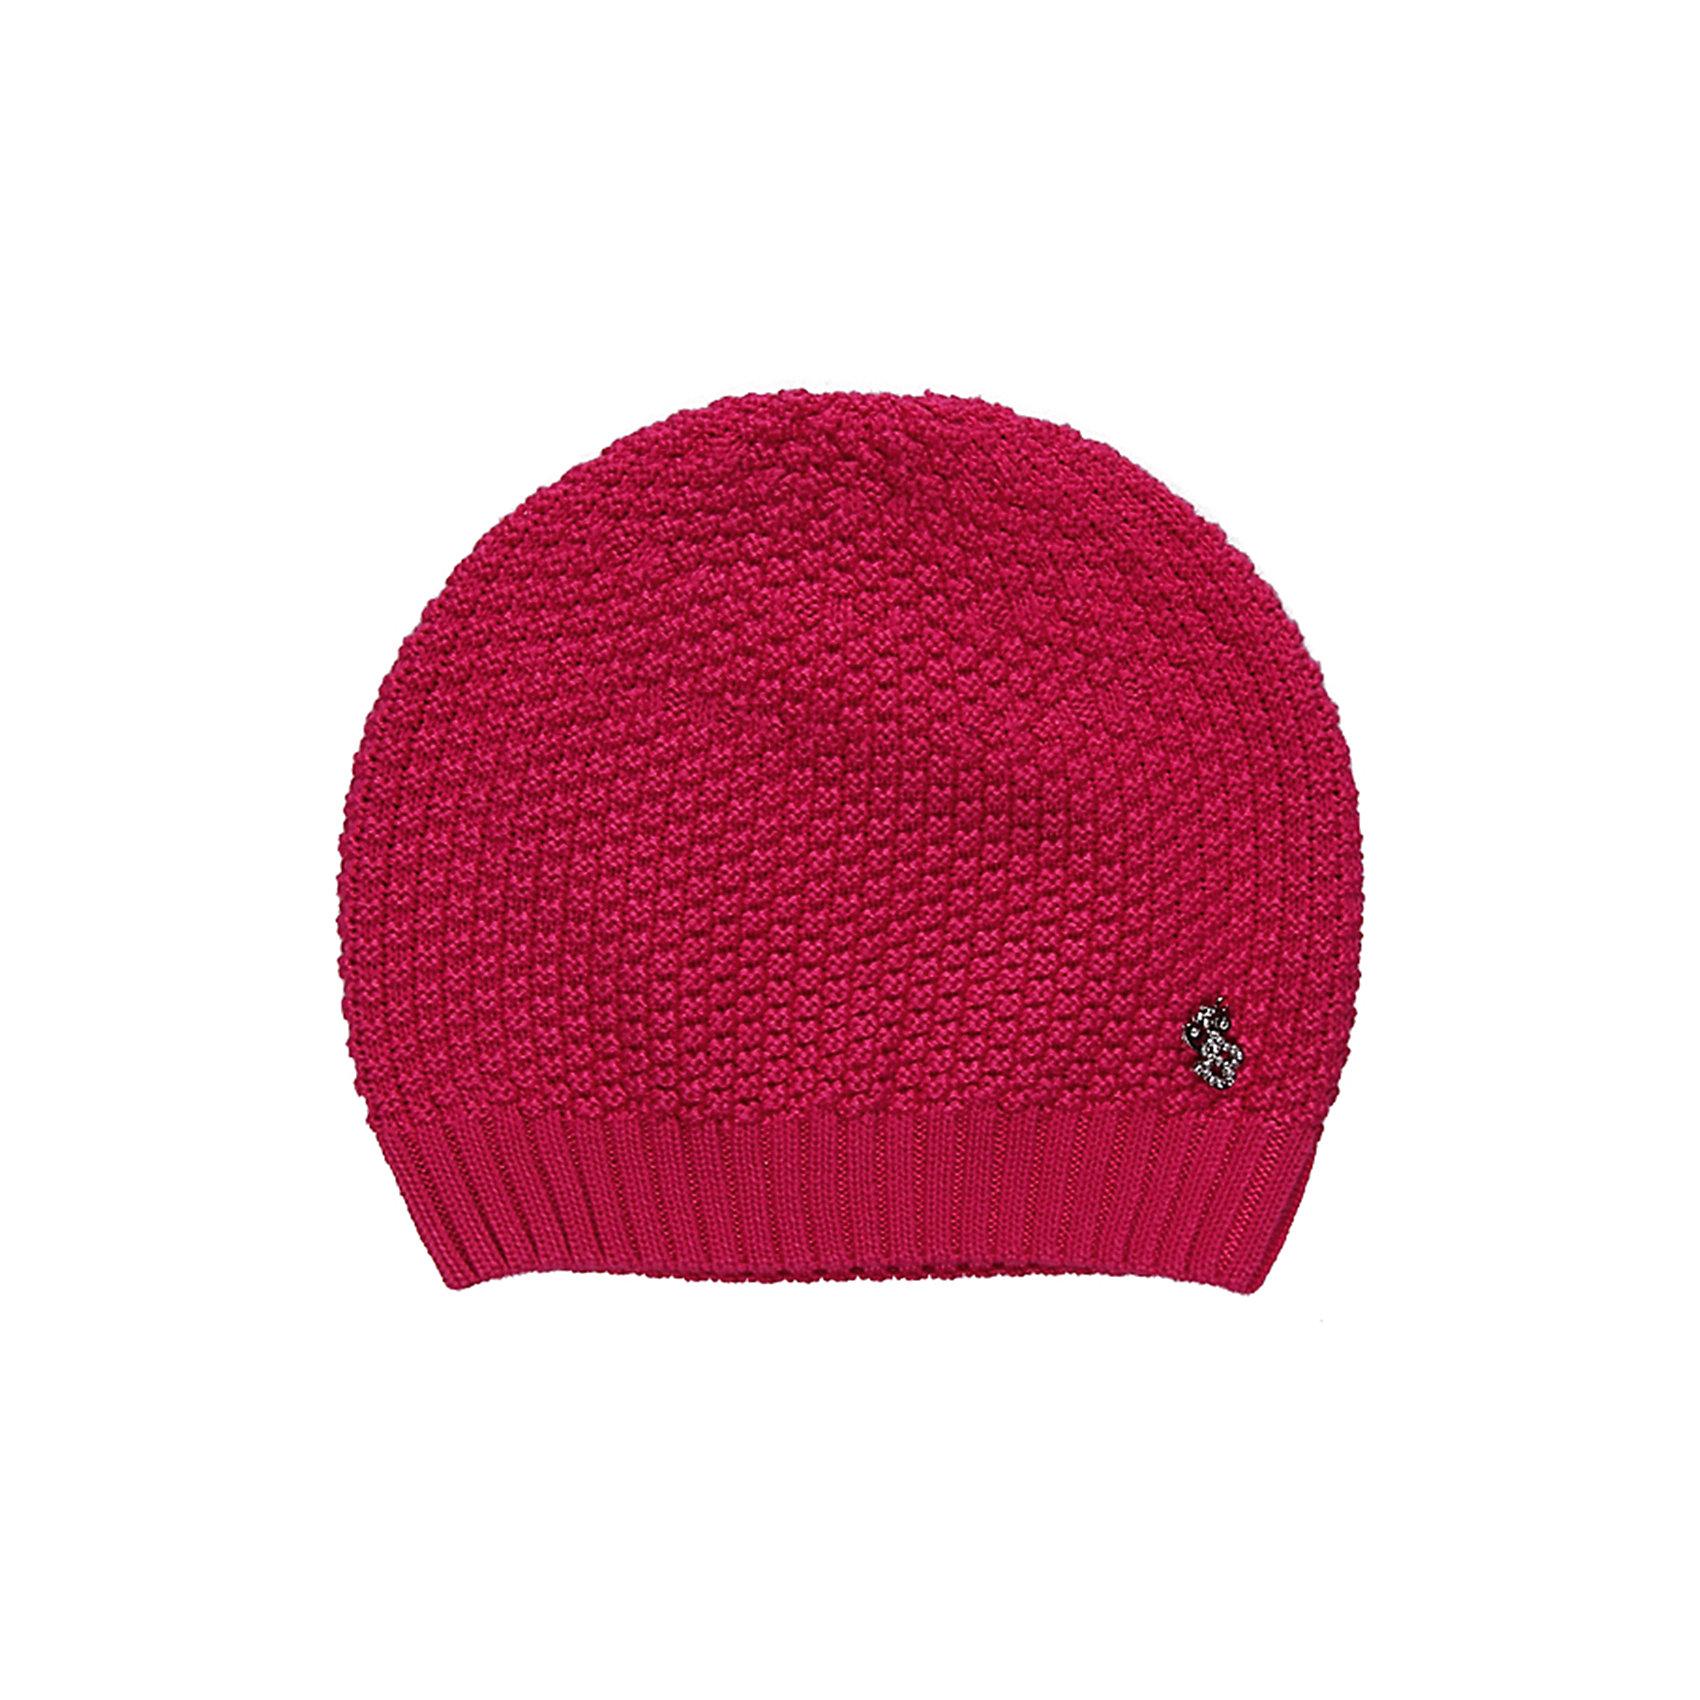 Шапка для девочки Sweet BerryГоловные уборы<br>Стильная объемная вязанная шапка для девочки.<br>Состав:<br>100% хлопок<br><br>Ширина мм: 89<br>Глубина мм: 117<br>Высота мм: 44<br>Вес г: 155<br>Цвет: розовый<br>Возраст от месяцев: 48<br>Возраст до месяцев: 60<br>Пол: Женский<br>Возраст: Детский<br>Размер: 52,54,50<br>SKU: 4520771